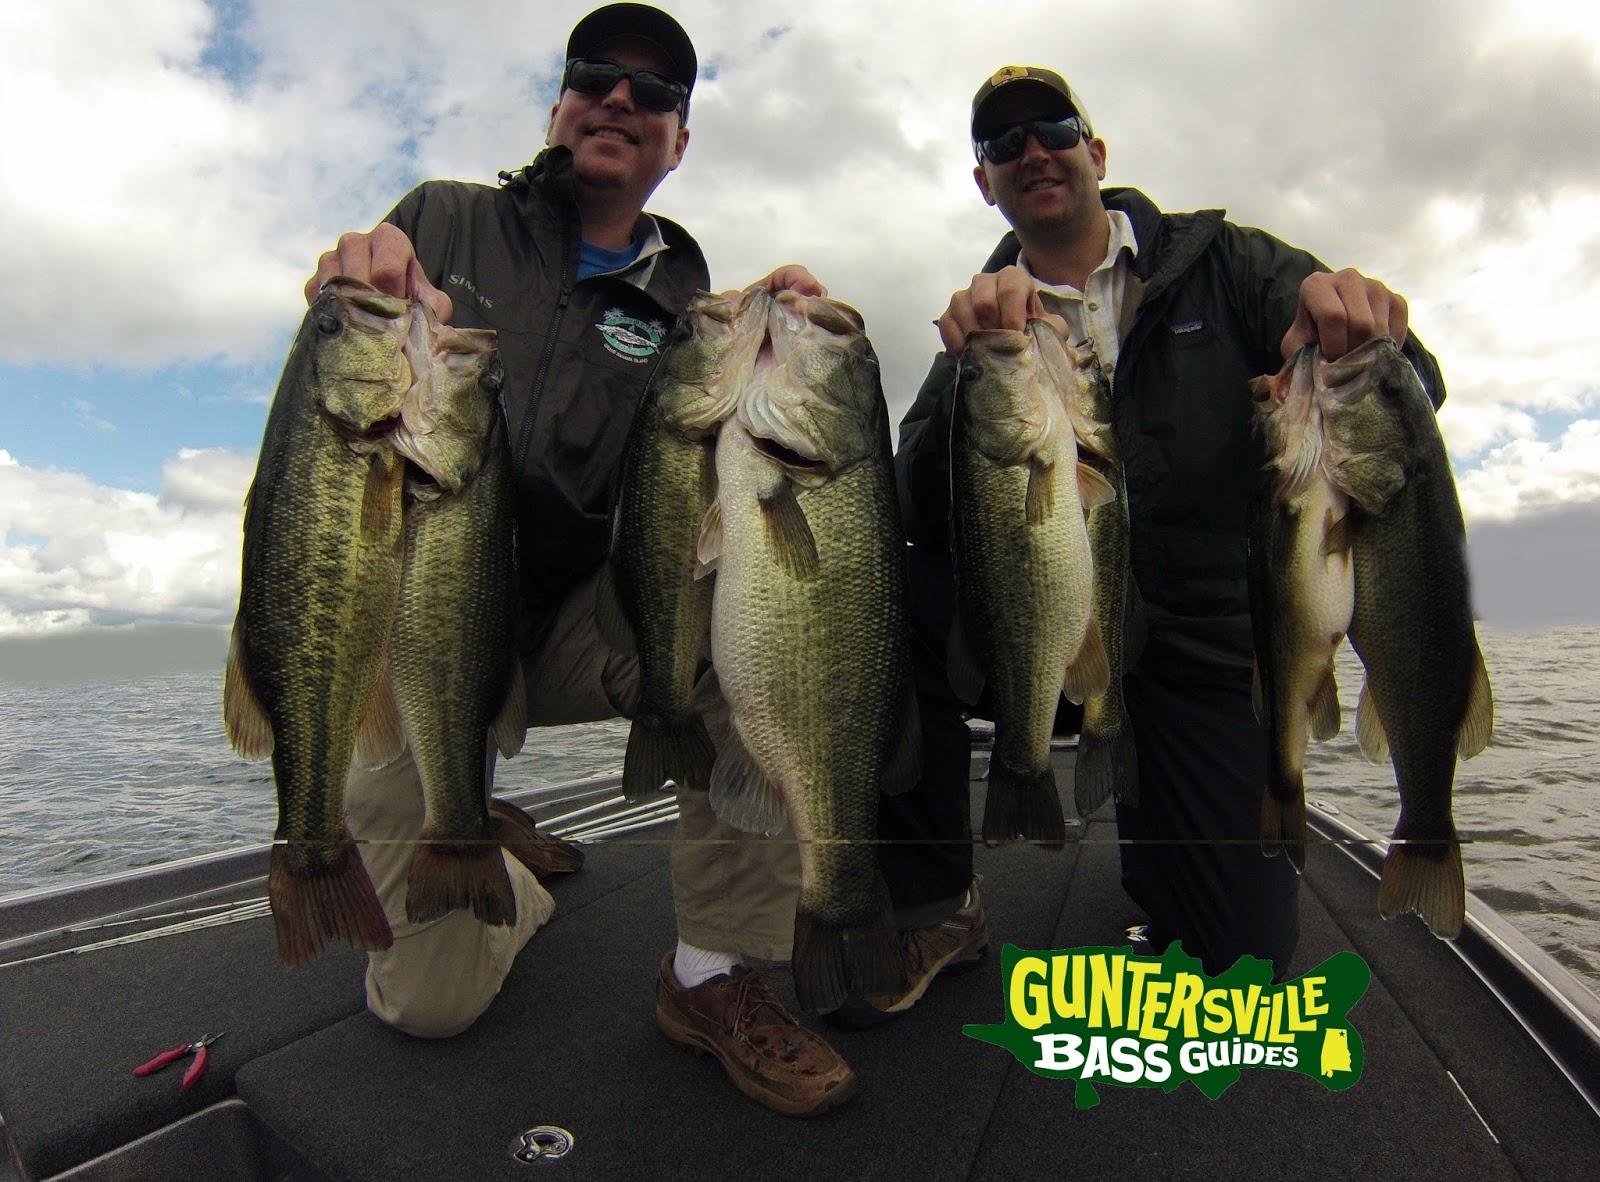 Lake guntersville fishing report guntersville bass guides for Lake eufaula alabama fishing report